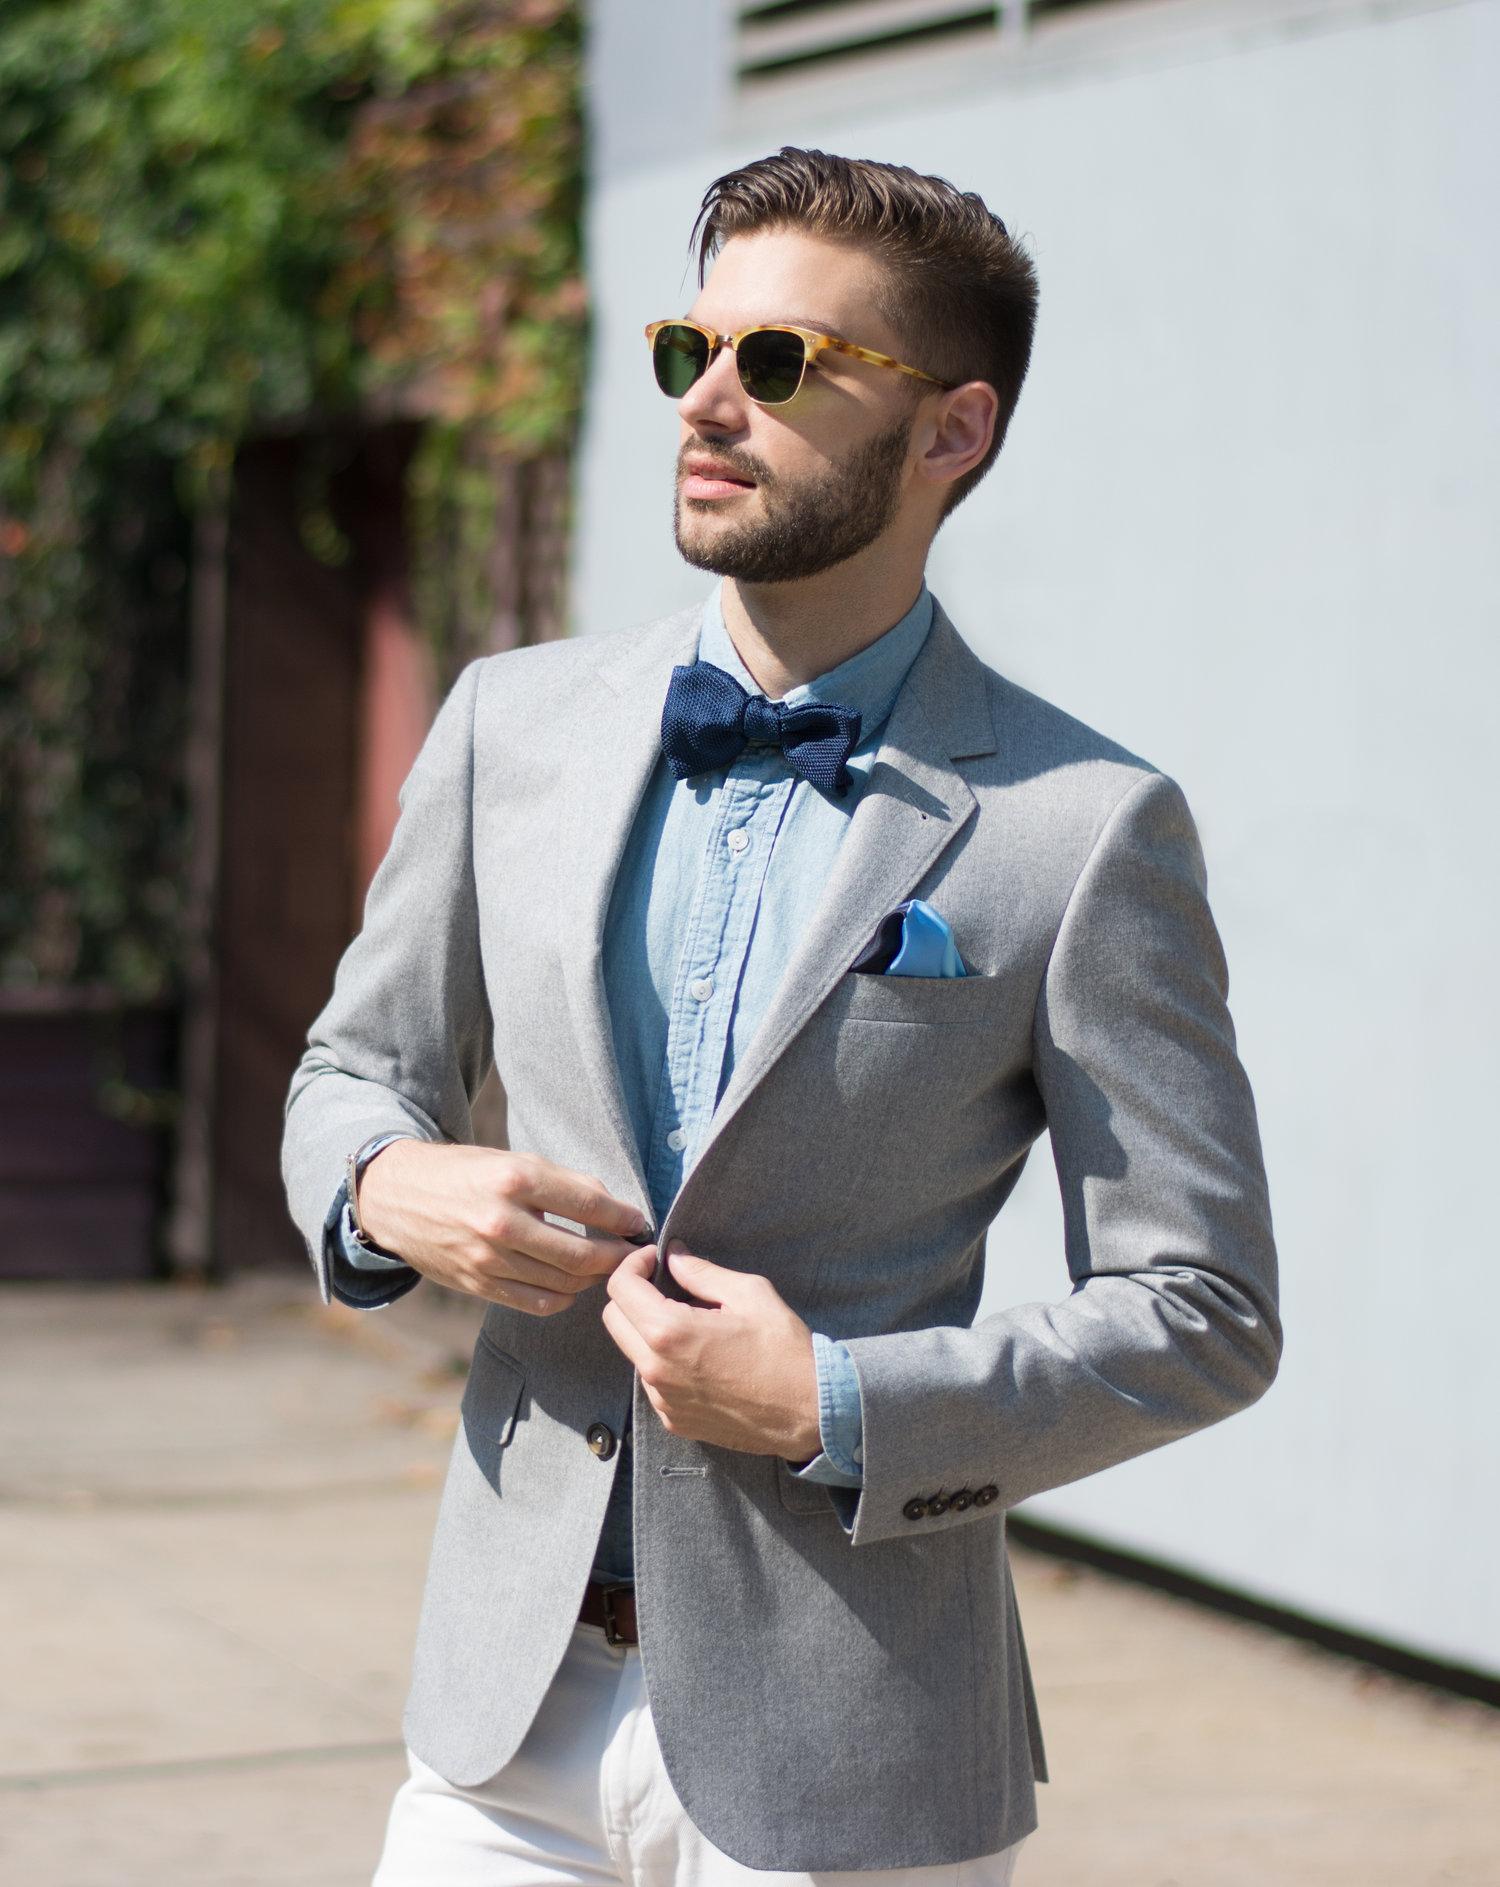 24b2c3ab597a How To Style a Bow Tie For A Wedding — The Modern Otter